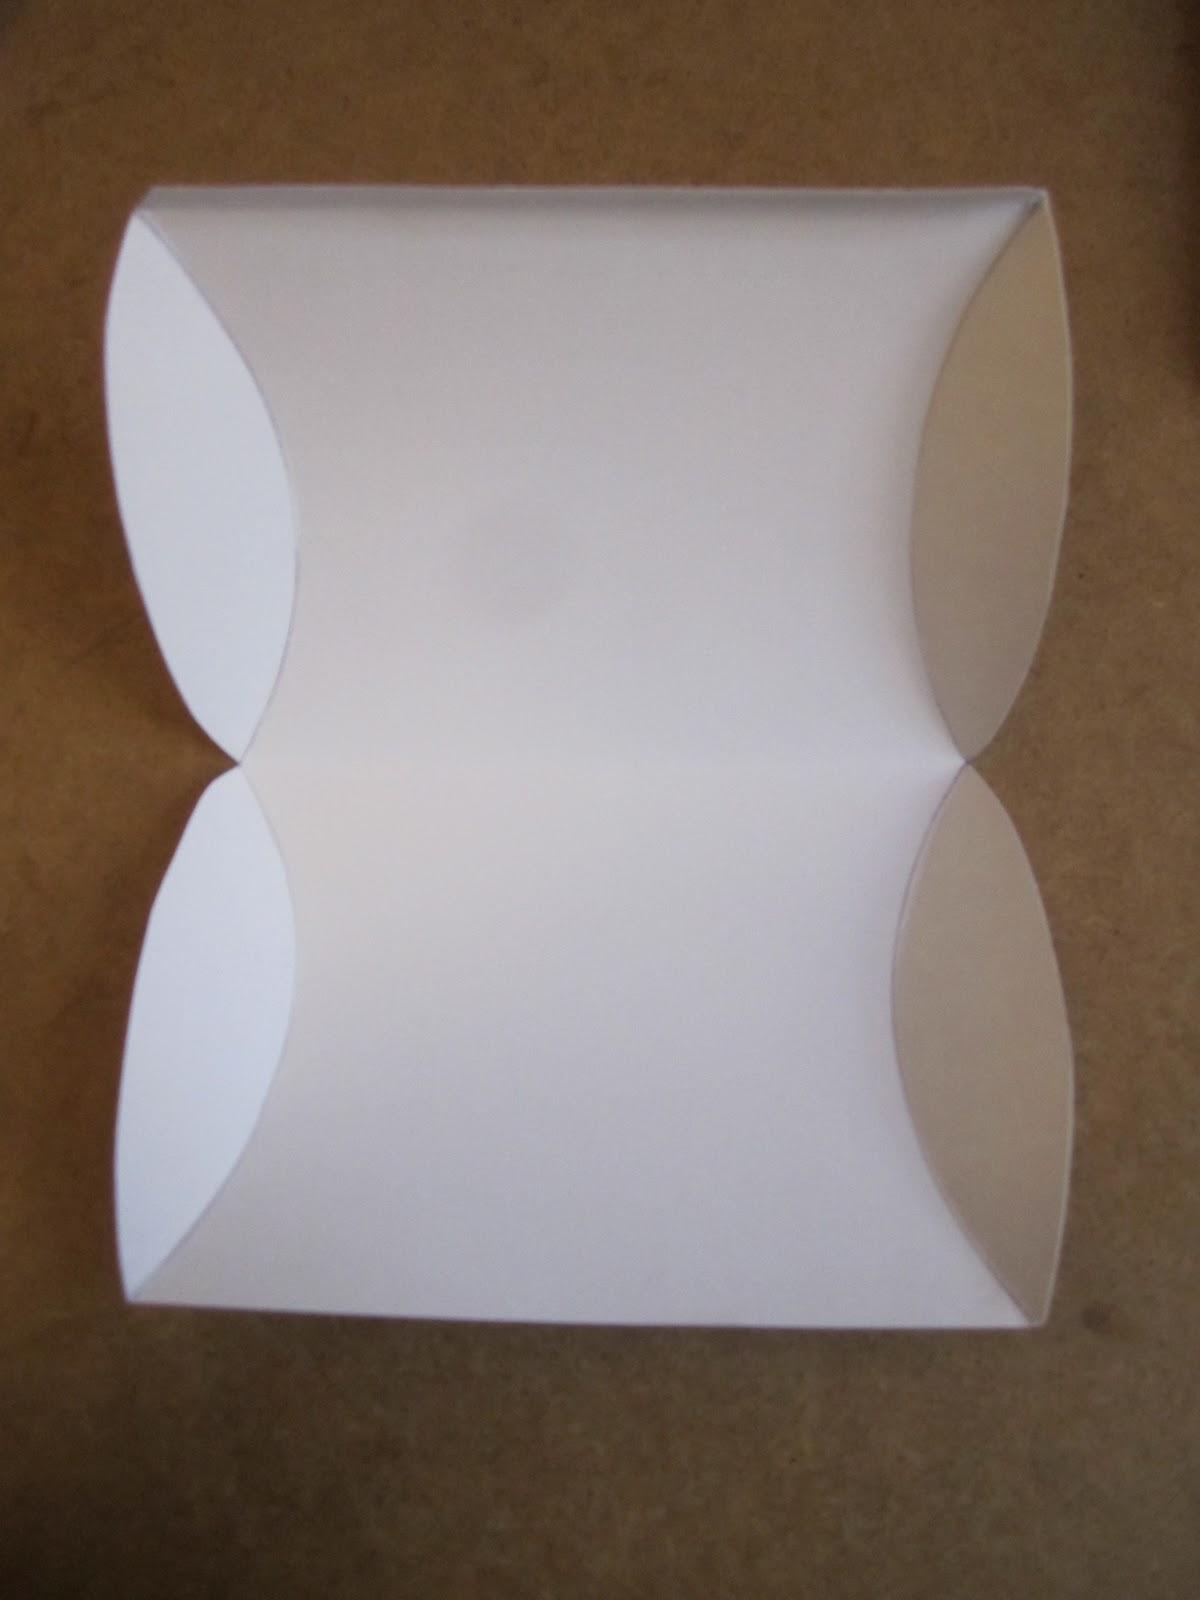 lottisland tutorial pillow box. Black Bedroom Furniture Sets. Home Design Ideas